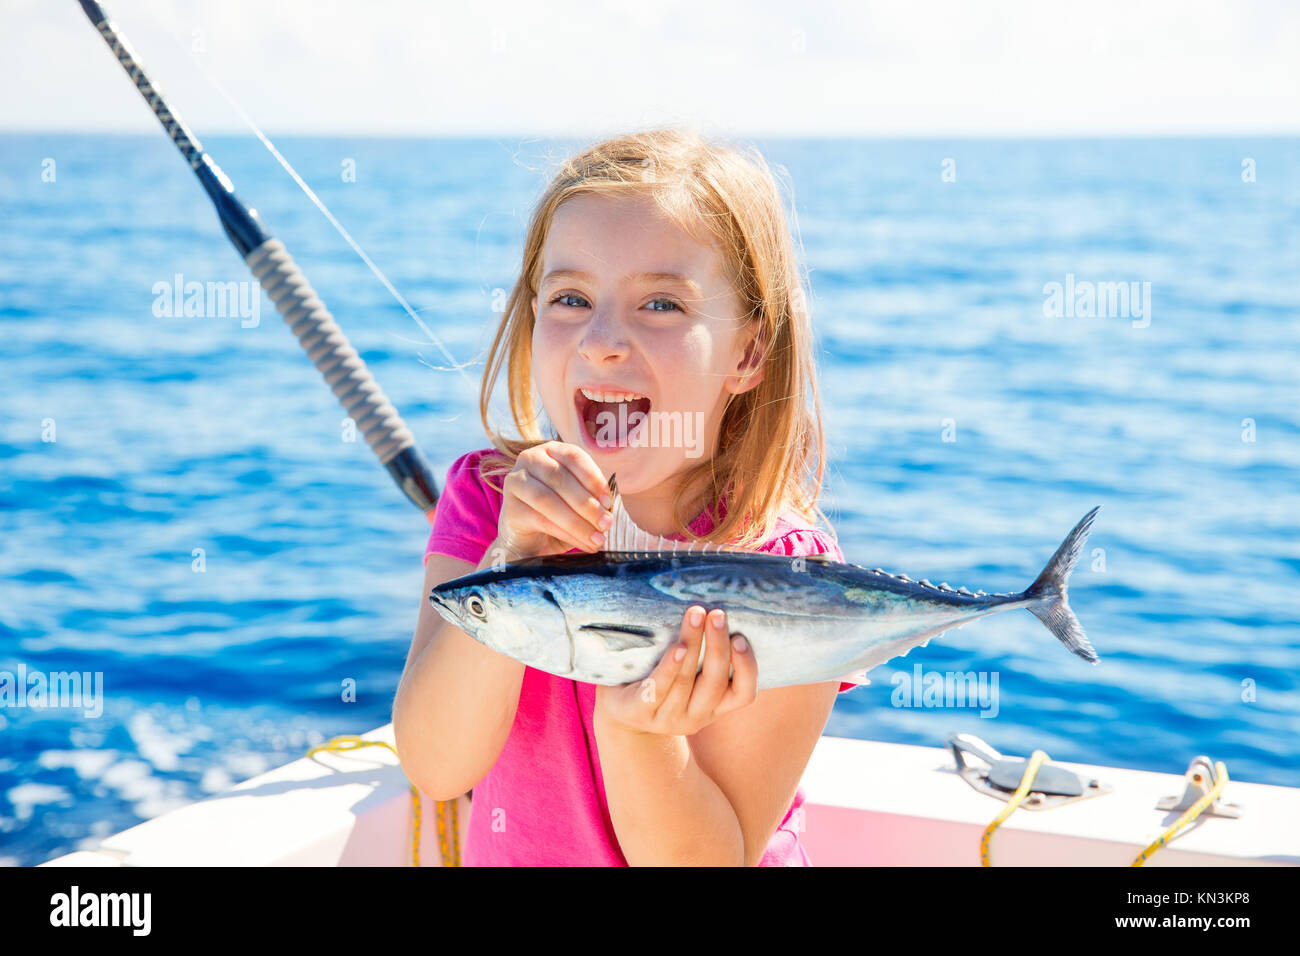 how to catch tuna trolling